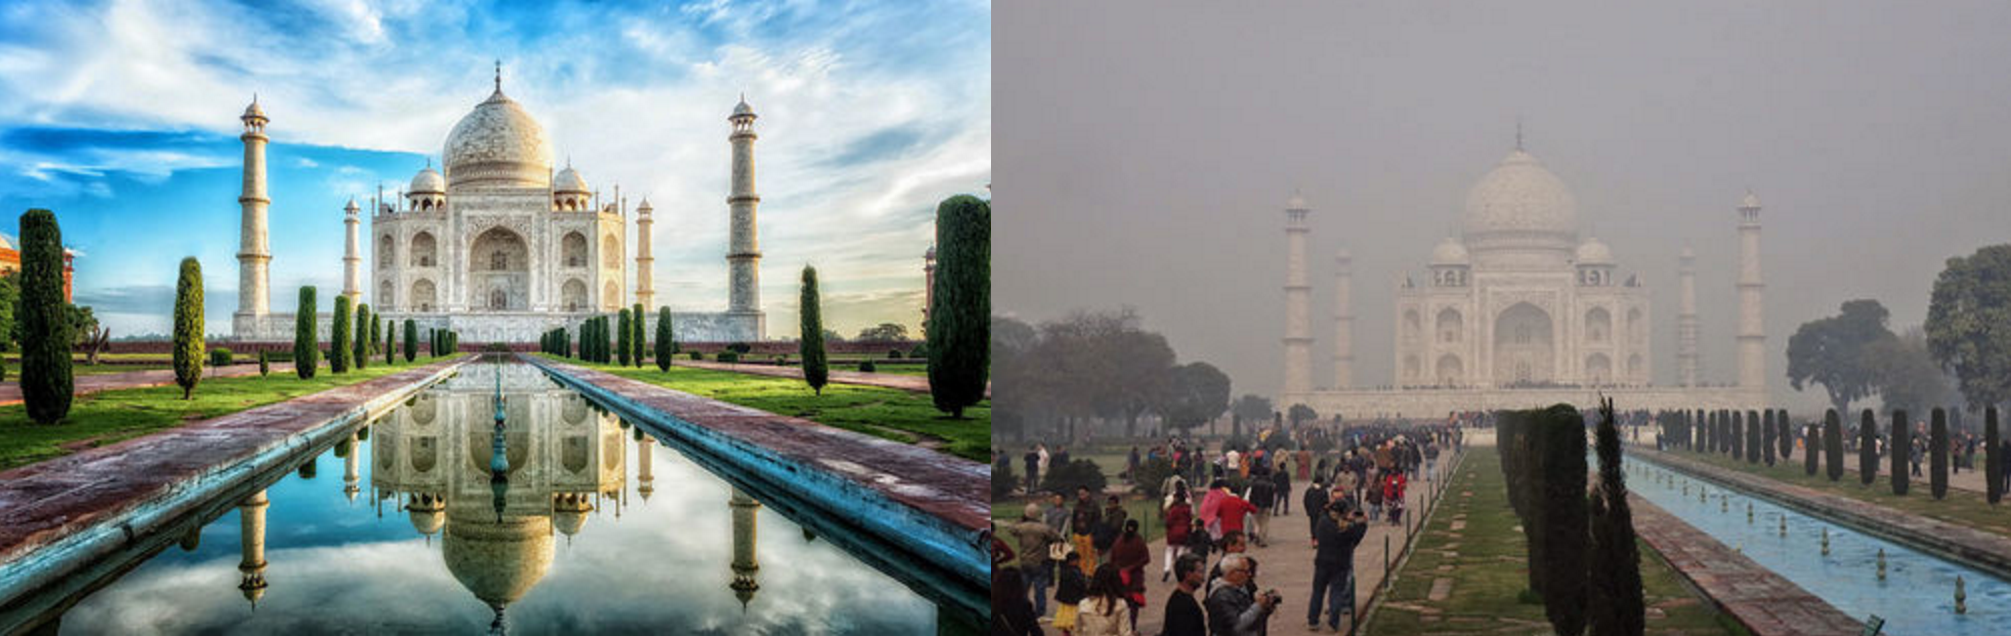 tourist attraction realities